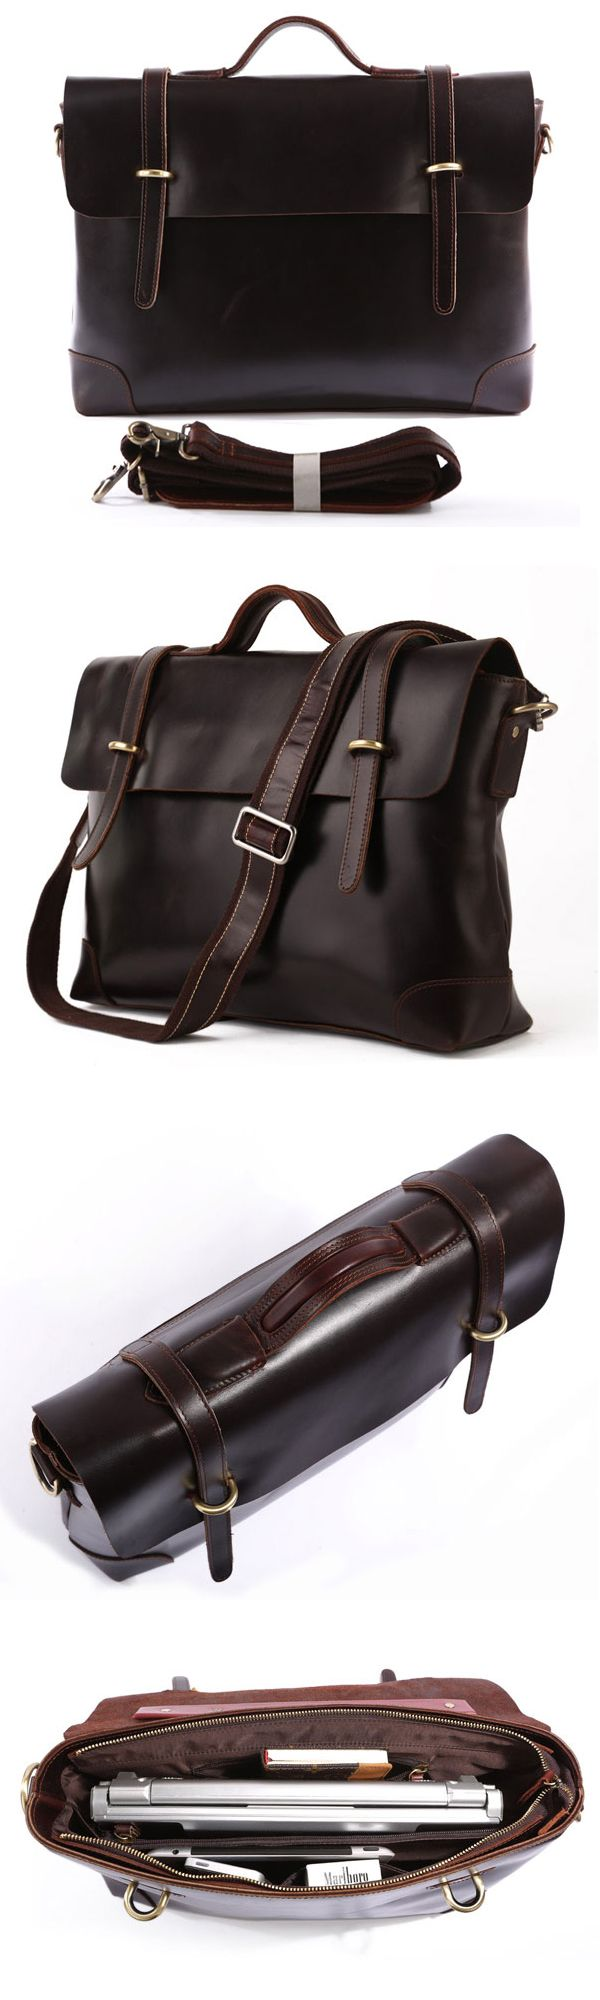 Best Gift Idea For Him Crazy Horse Leather Briefcase Laptop Messenger Bag Ipad Macbook Bag